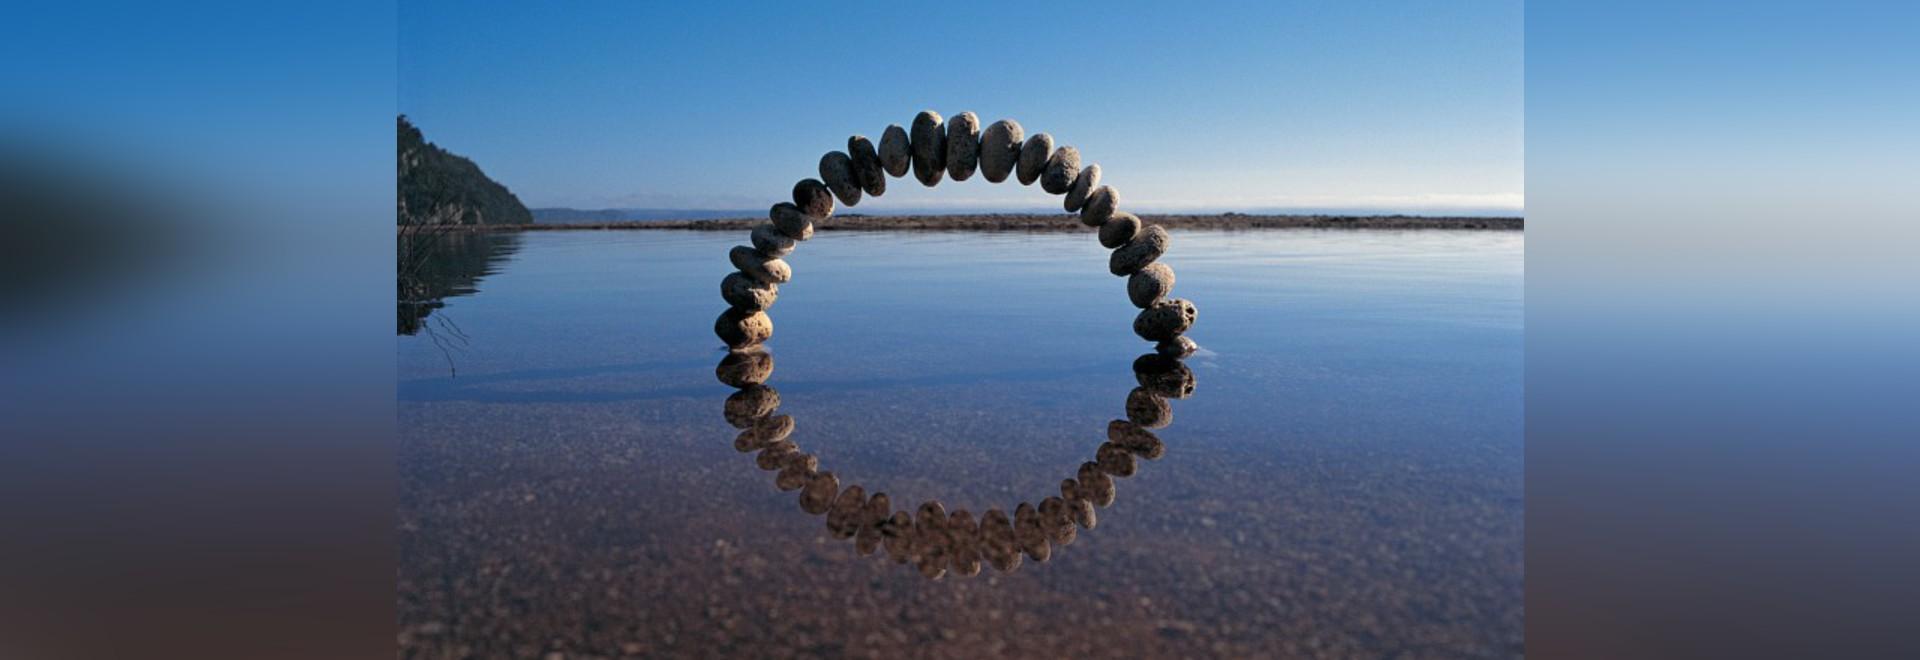 NATURAL, EPHEMERAL DESIGNS EXPRESS THE CYCLE OF LIFE